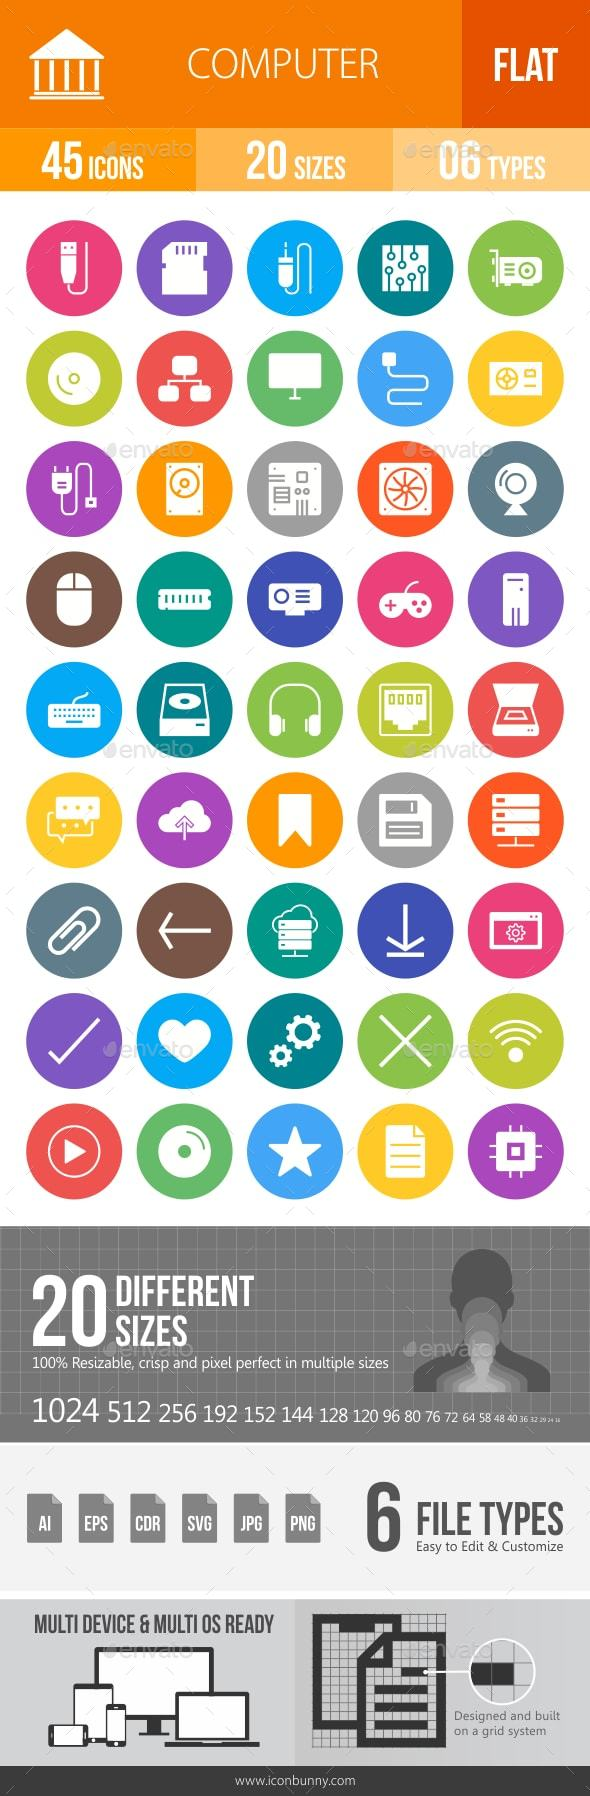 Computer Hardware Flat Round Icons - Icons